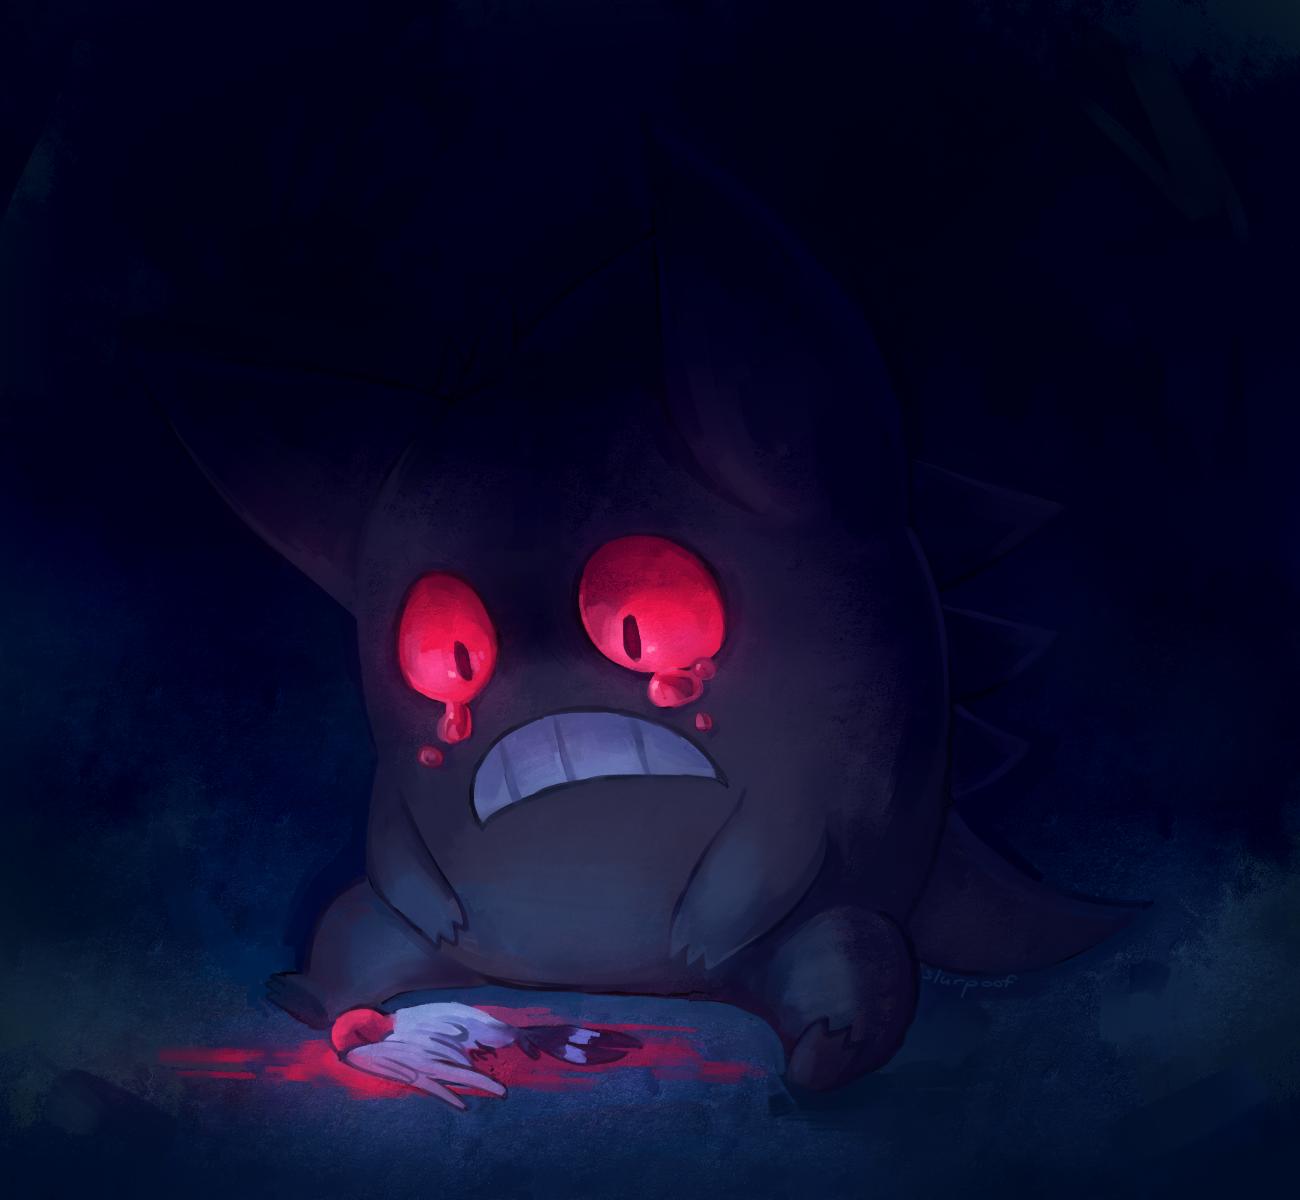 Gengar, the Shadow Pokemon by slurpoof on DeviantArt